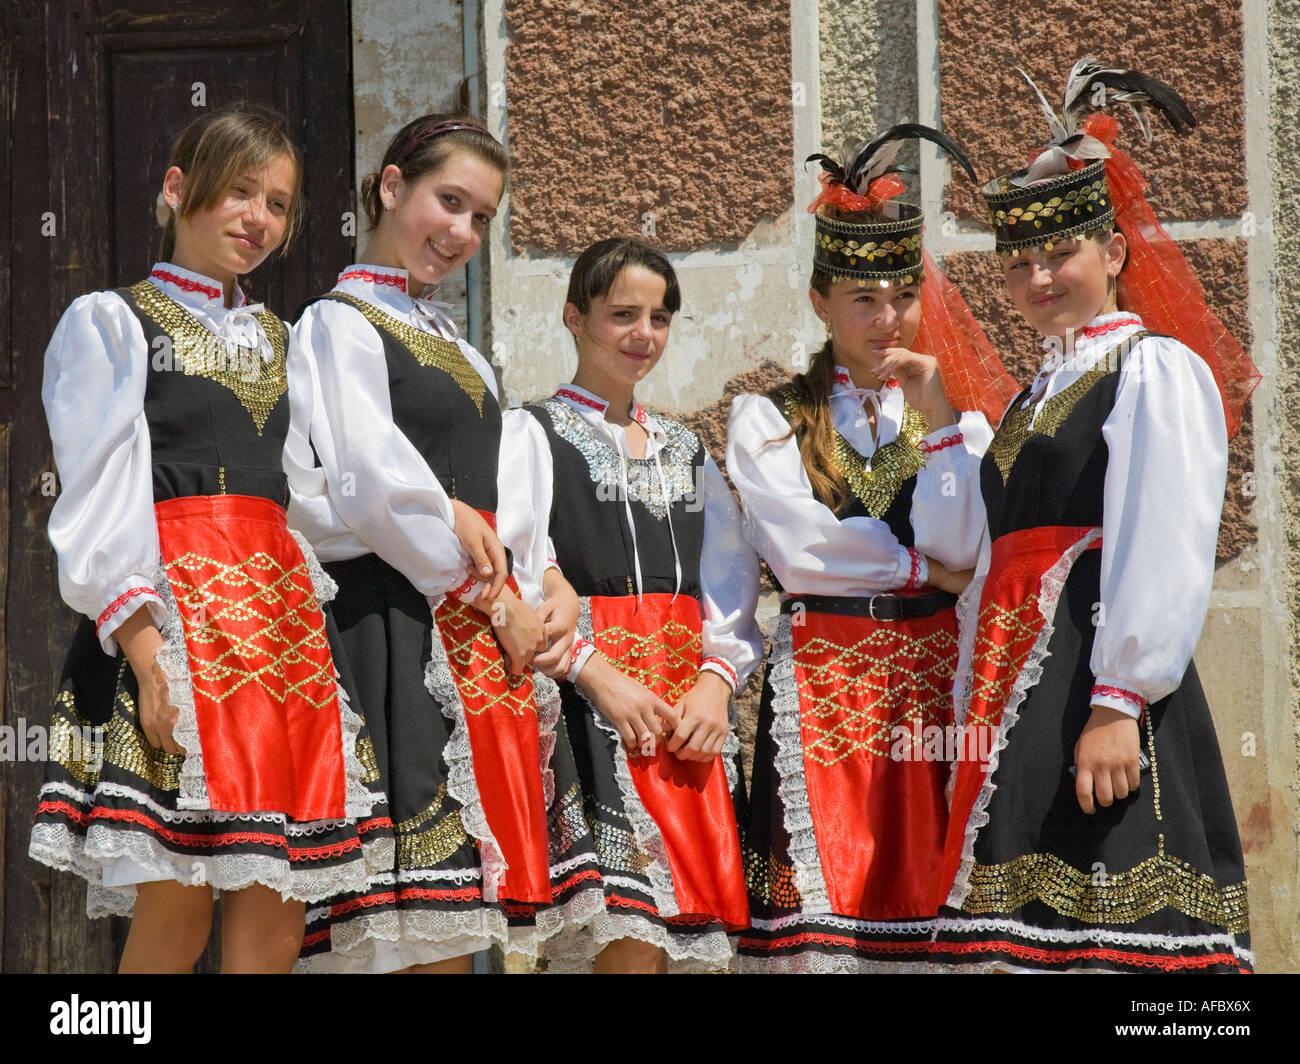 Five young girls in traditional Ukrainian costumes in Plotzk / Ukraine Stock Photo